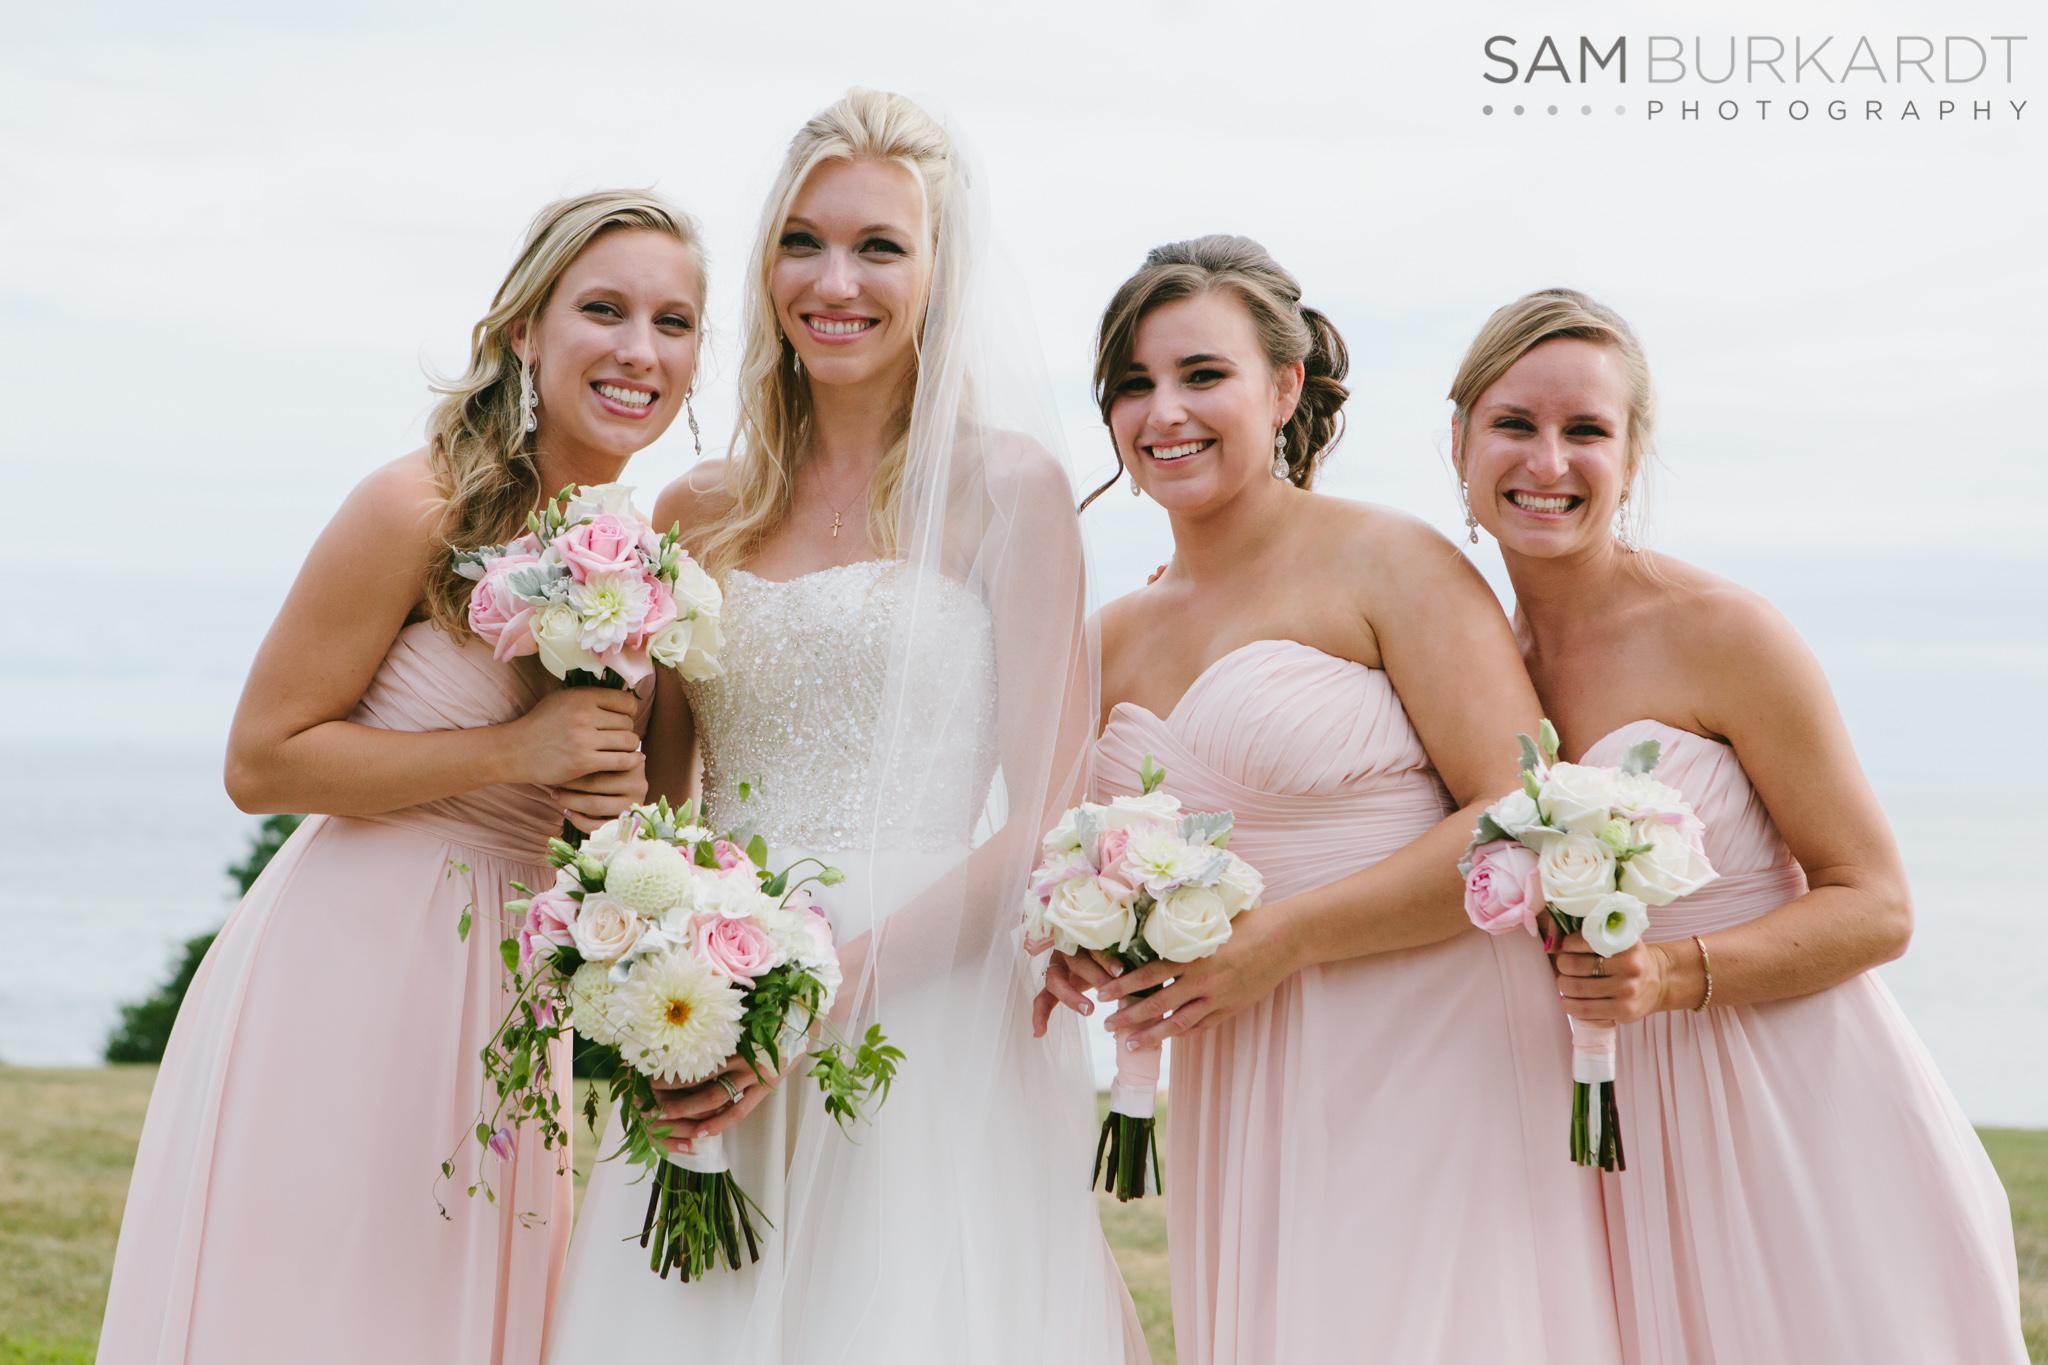 samburkardt_platz_moore_connecticut_branford_house_long_island_sound_august_photography_wedding_glamour_pink_0032.jpg